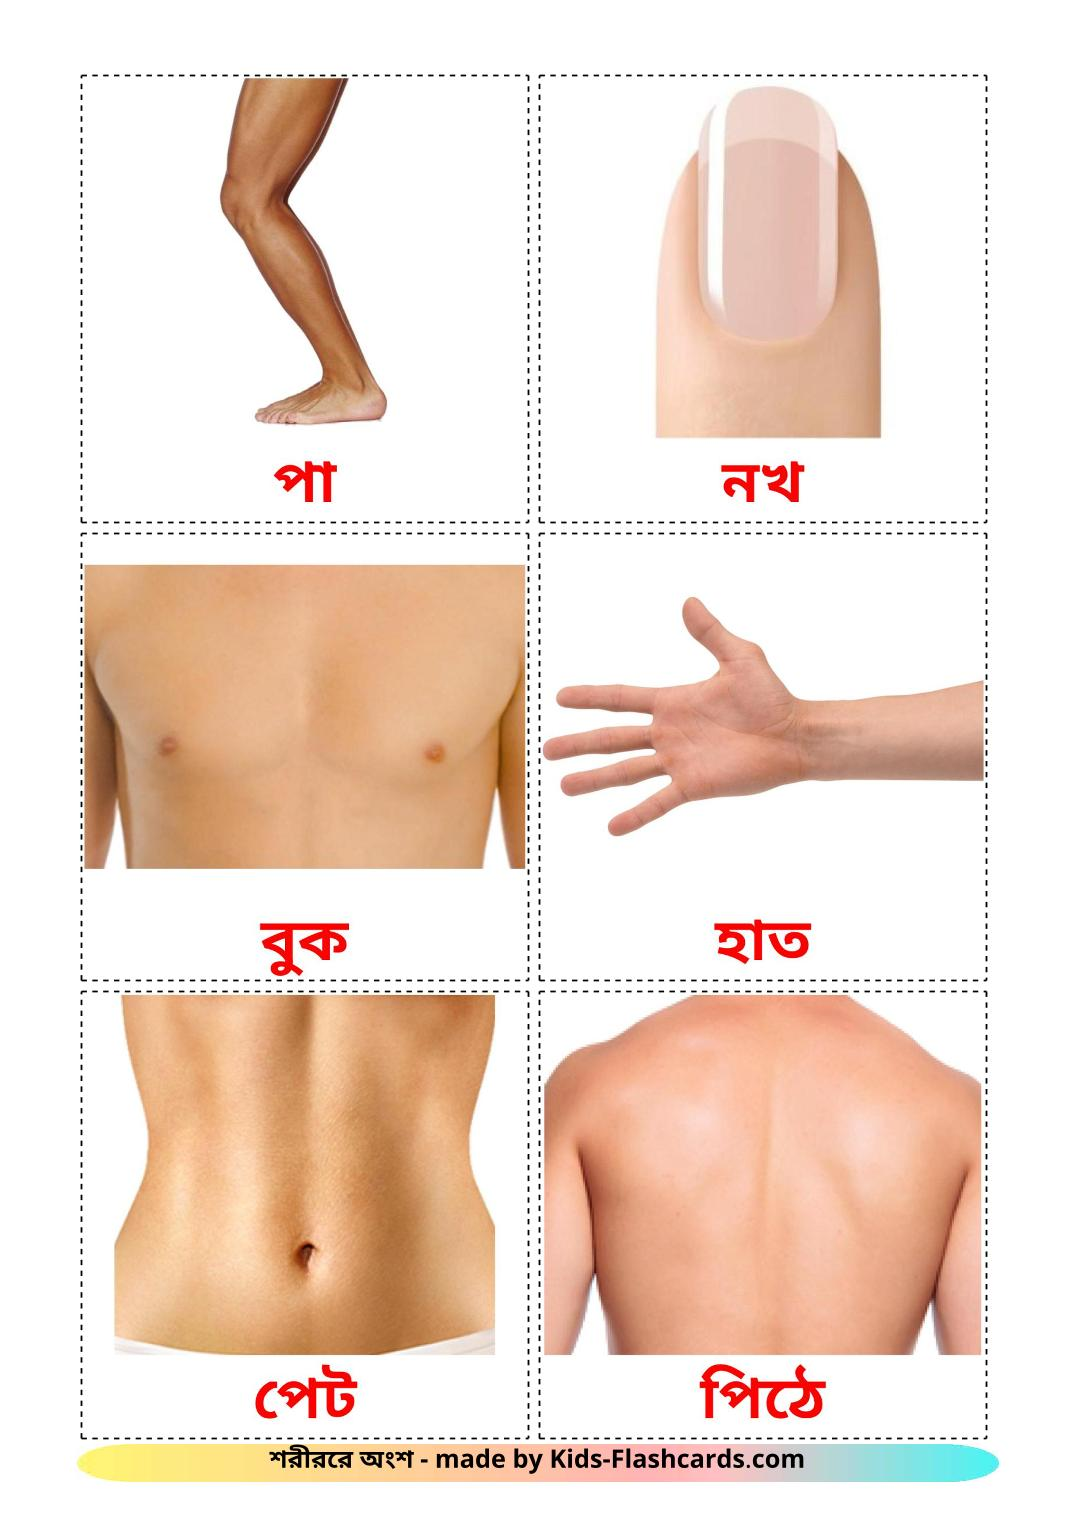 Body Parts - 26 Free Printable bengali Flashcards